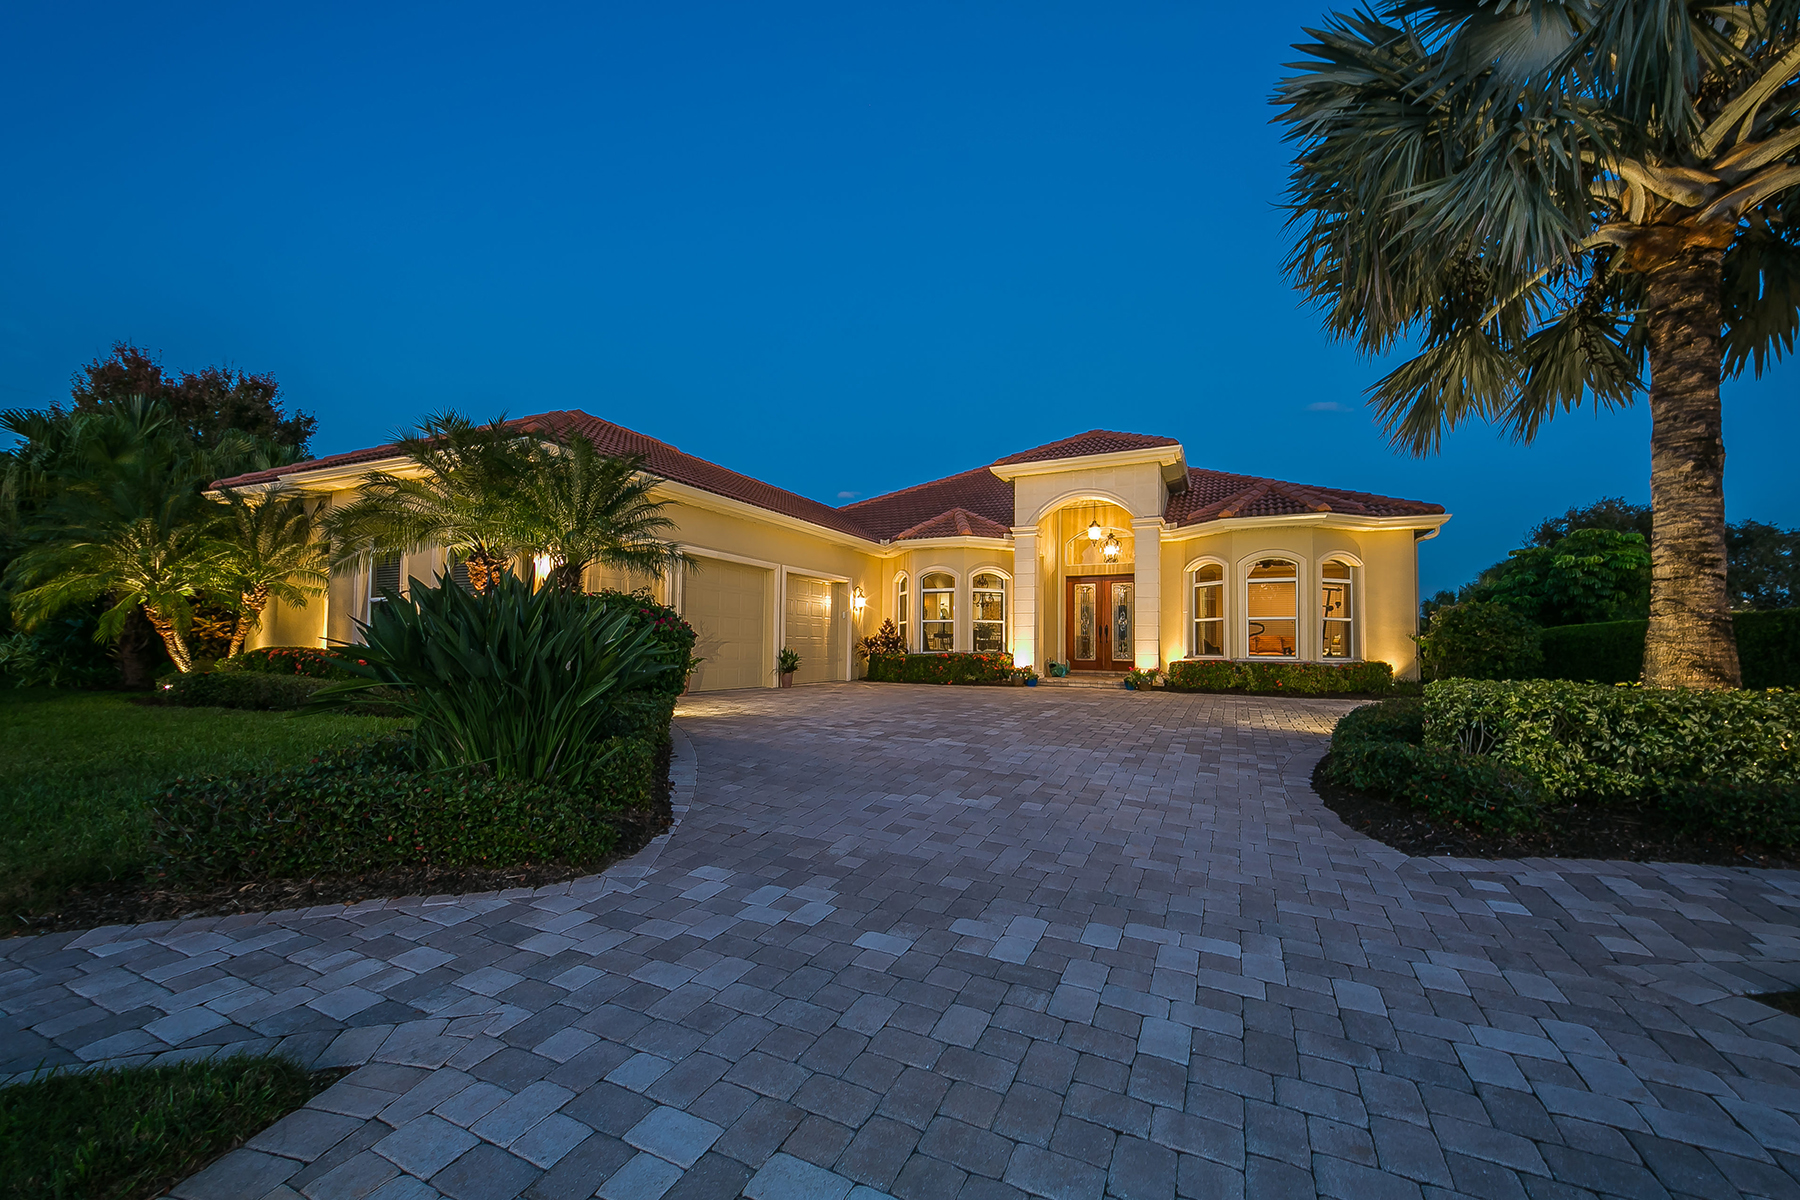 Single Family Home for Active at BOCA ROYALE 1774 Grande Park Dr Englewood, Florida 34223 United States